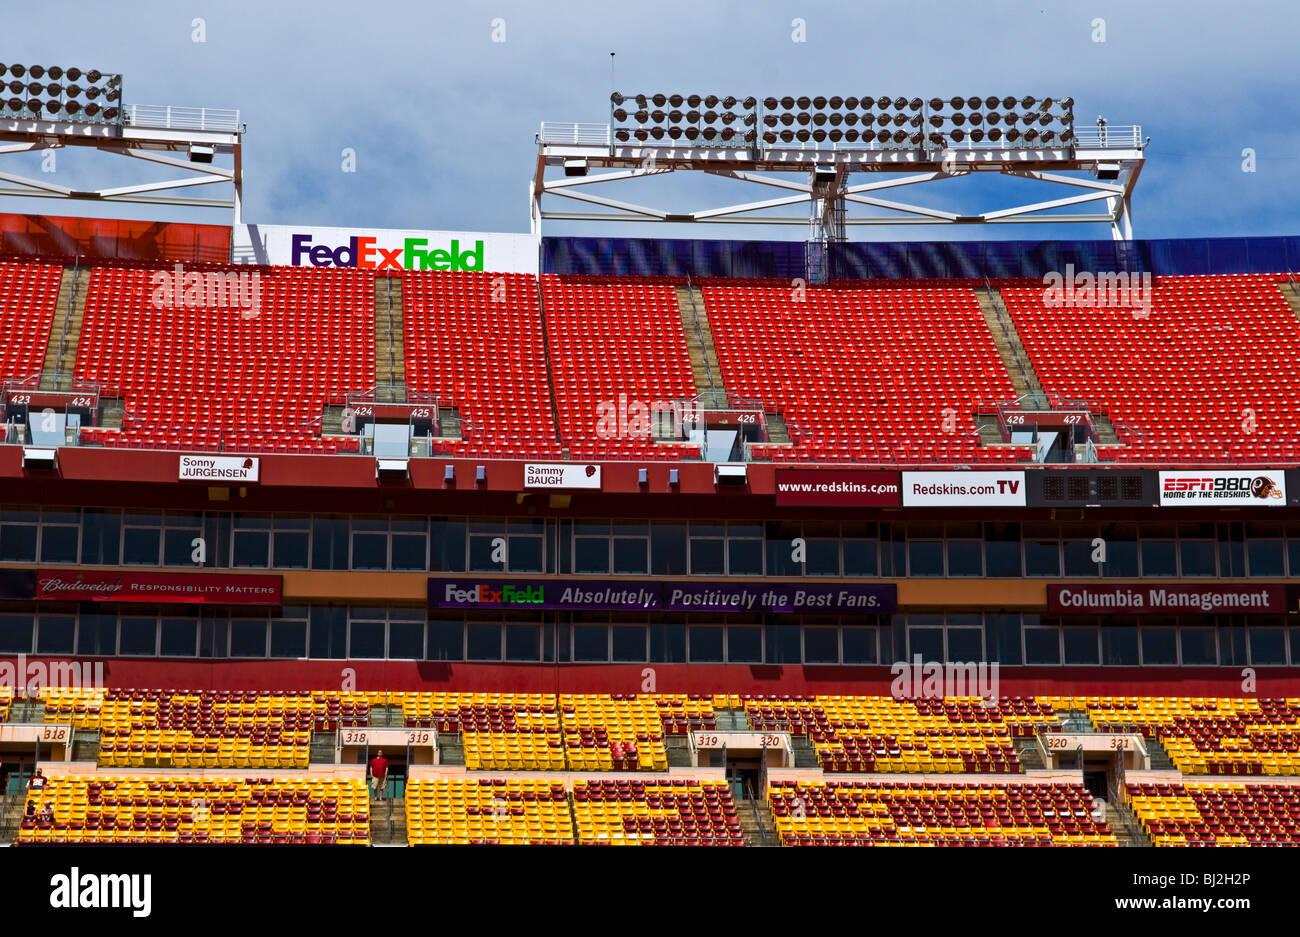 An empty stadium - FED EX Field Home of the Washington Redskins NFL Football team, - Stock Image